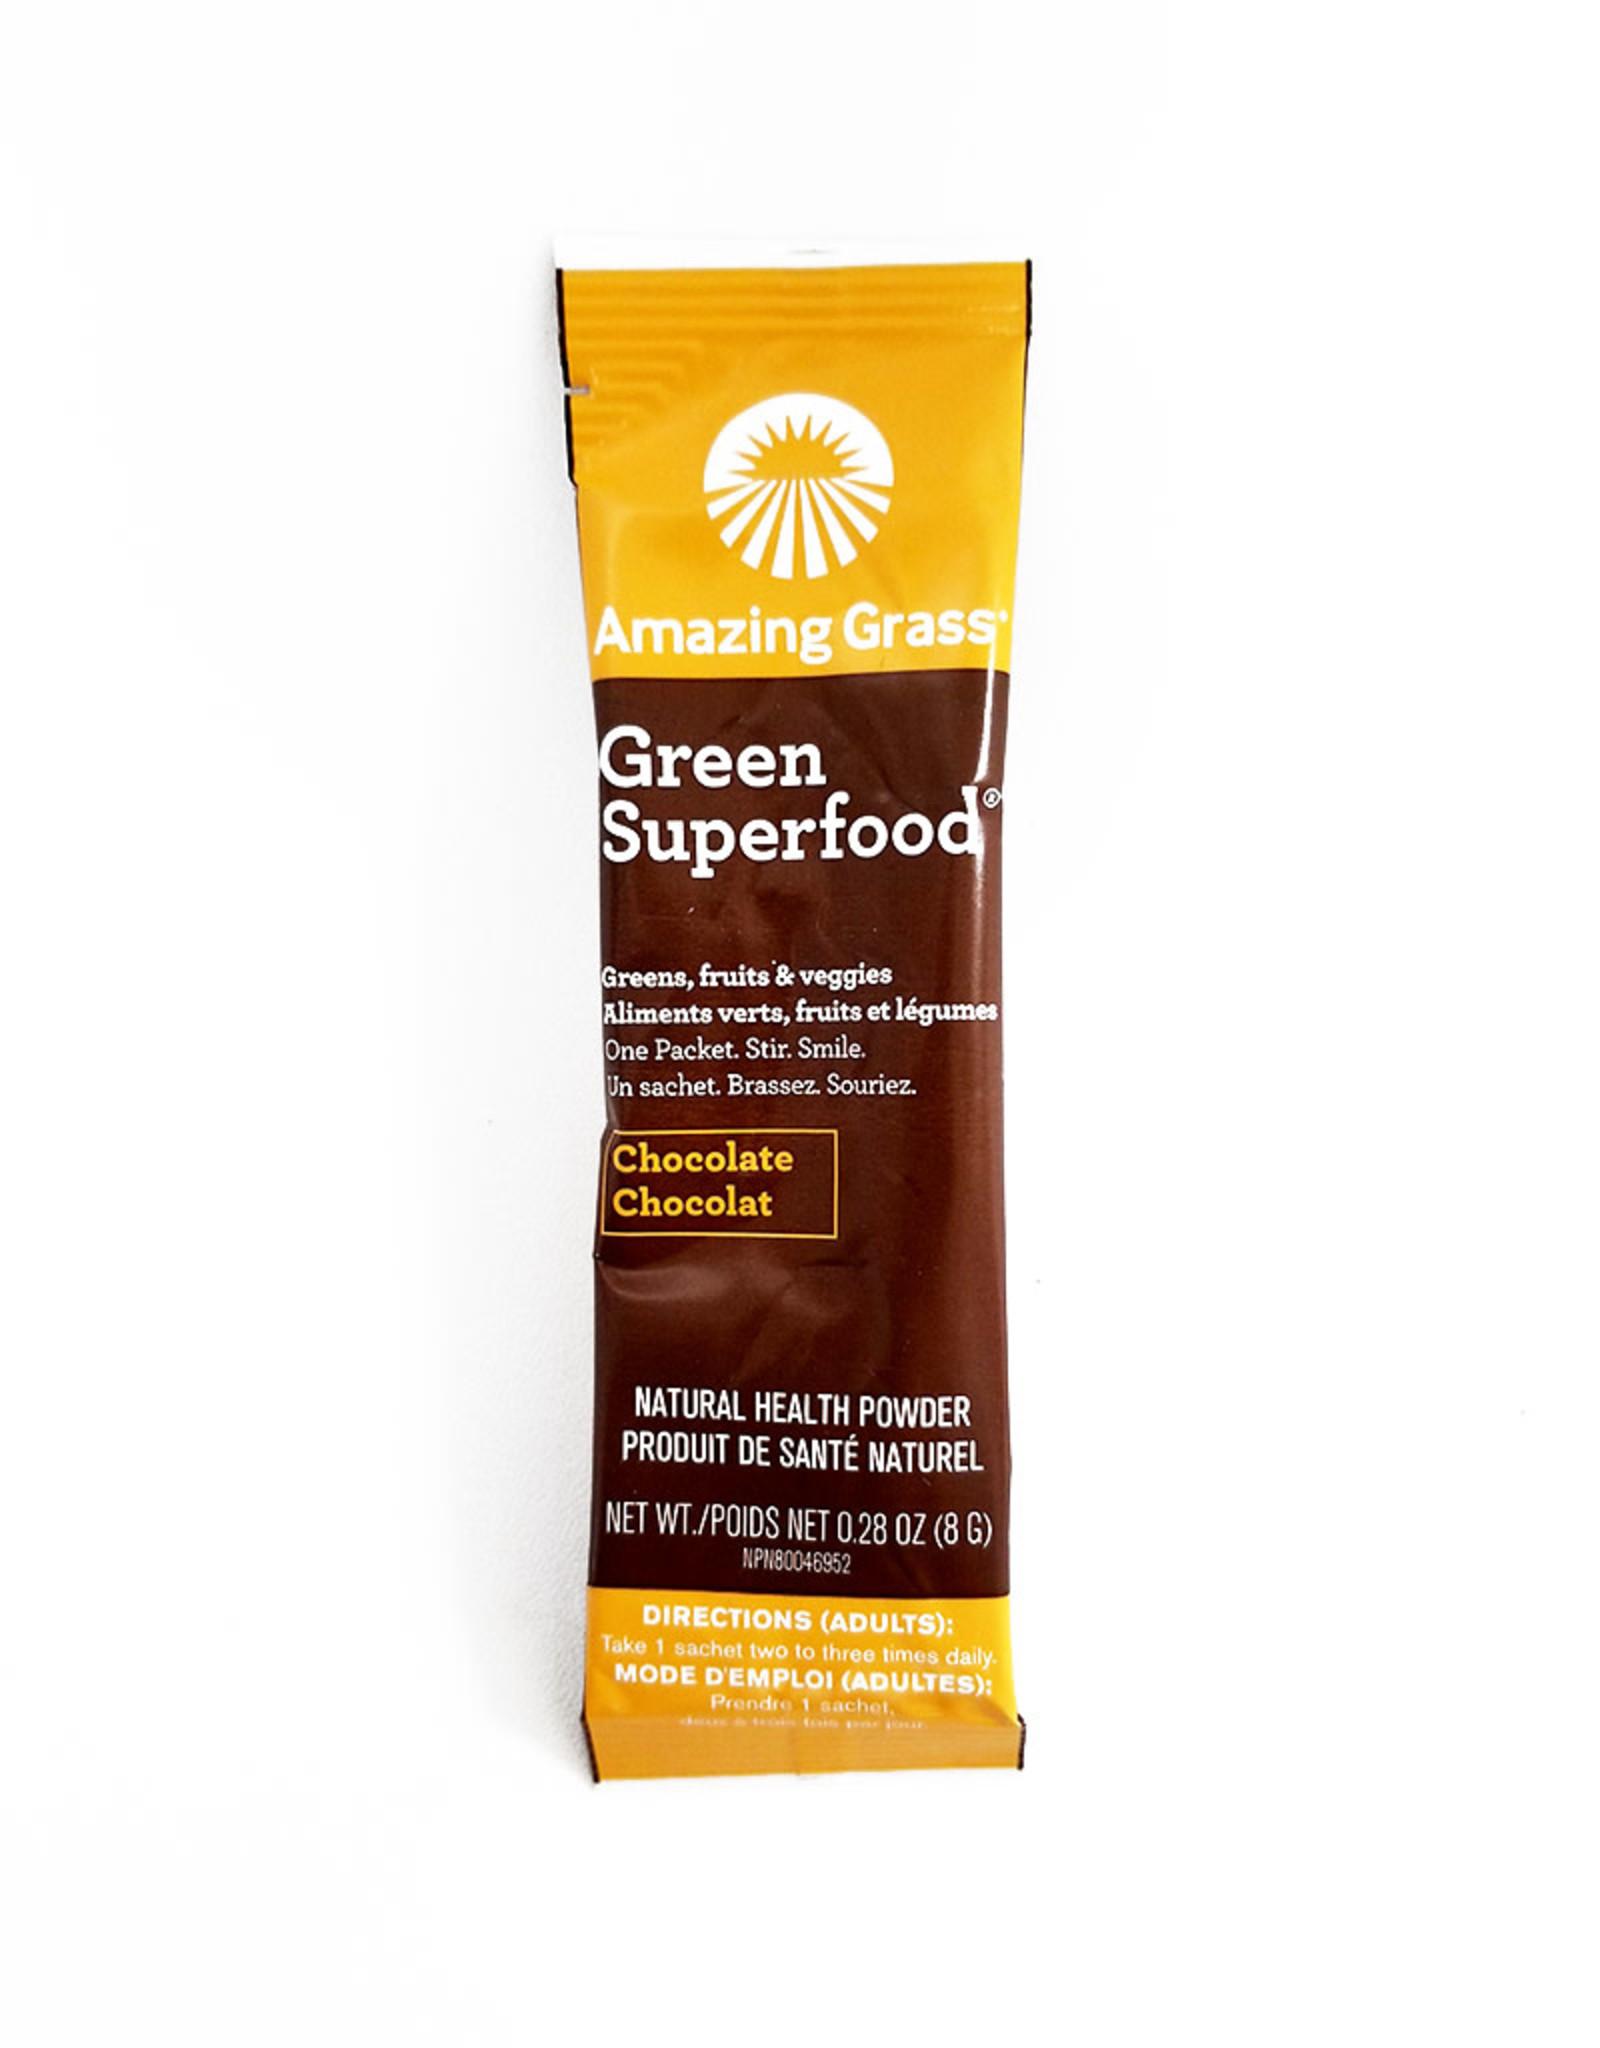 Amazing Grass Amazing Grass - Green Superfood, Chocolate (8g)